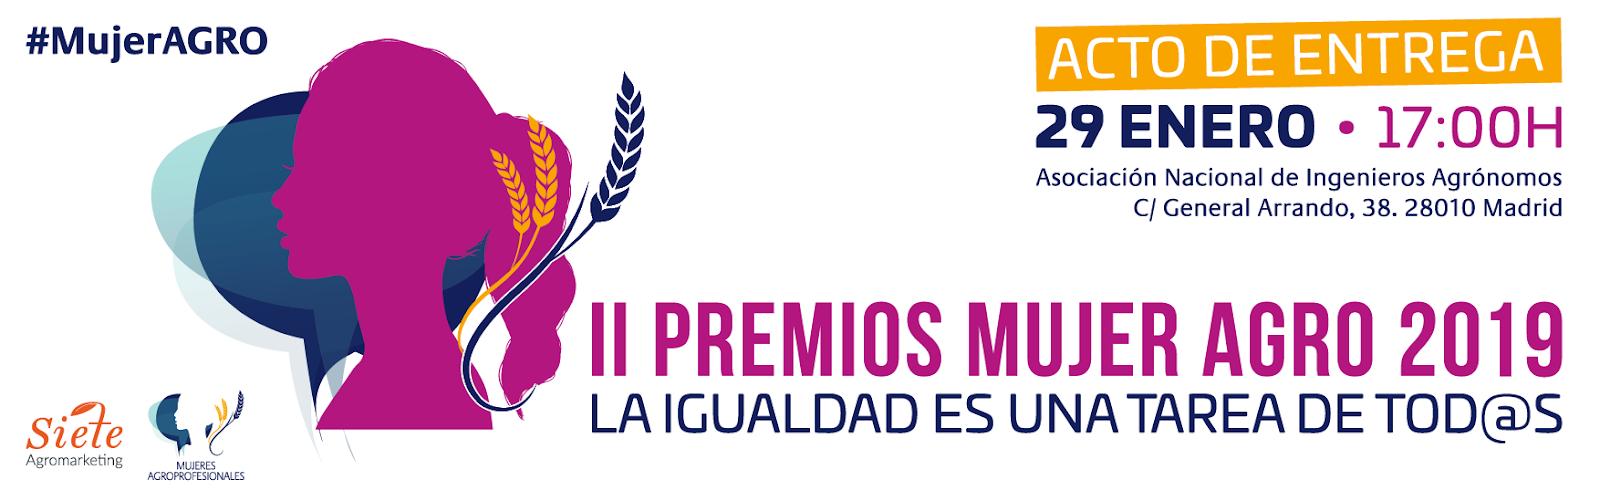 #mujerAGRO - Foro Nacional Business Agro: Mujeres Agroprofesionales